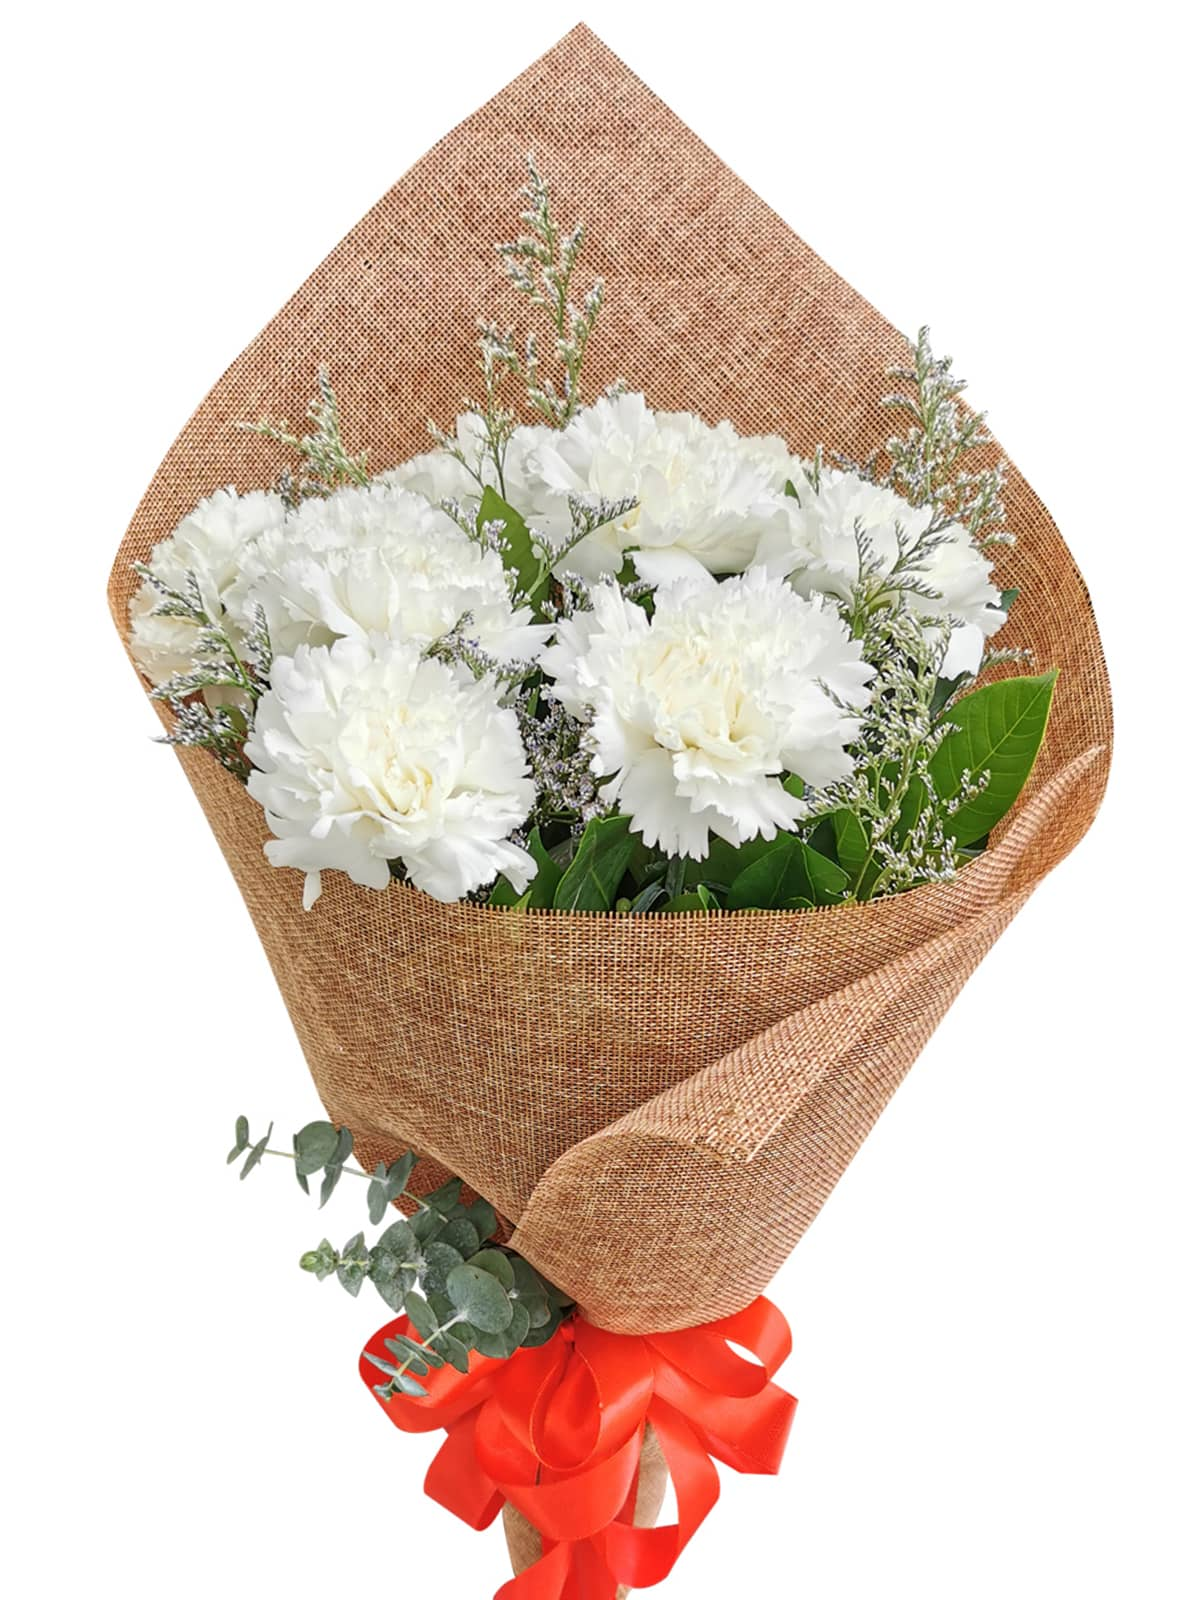 WHITE Carnation Burlap ch